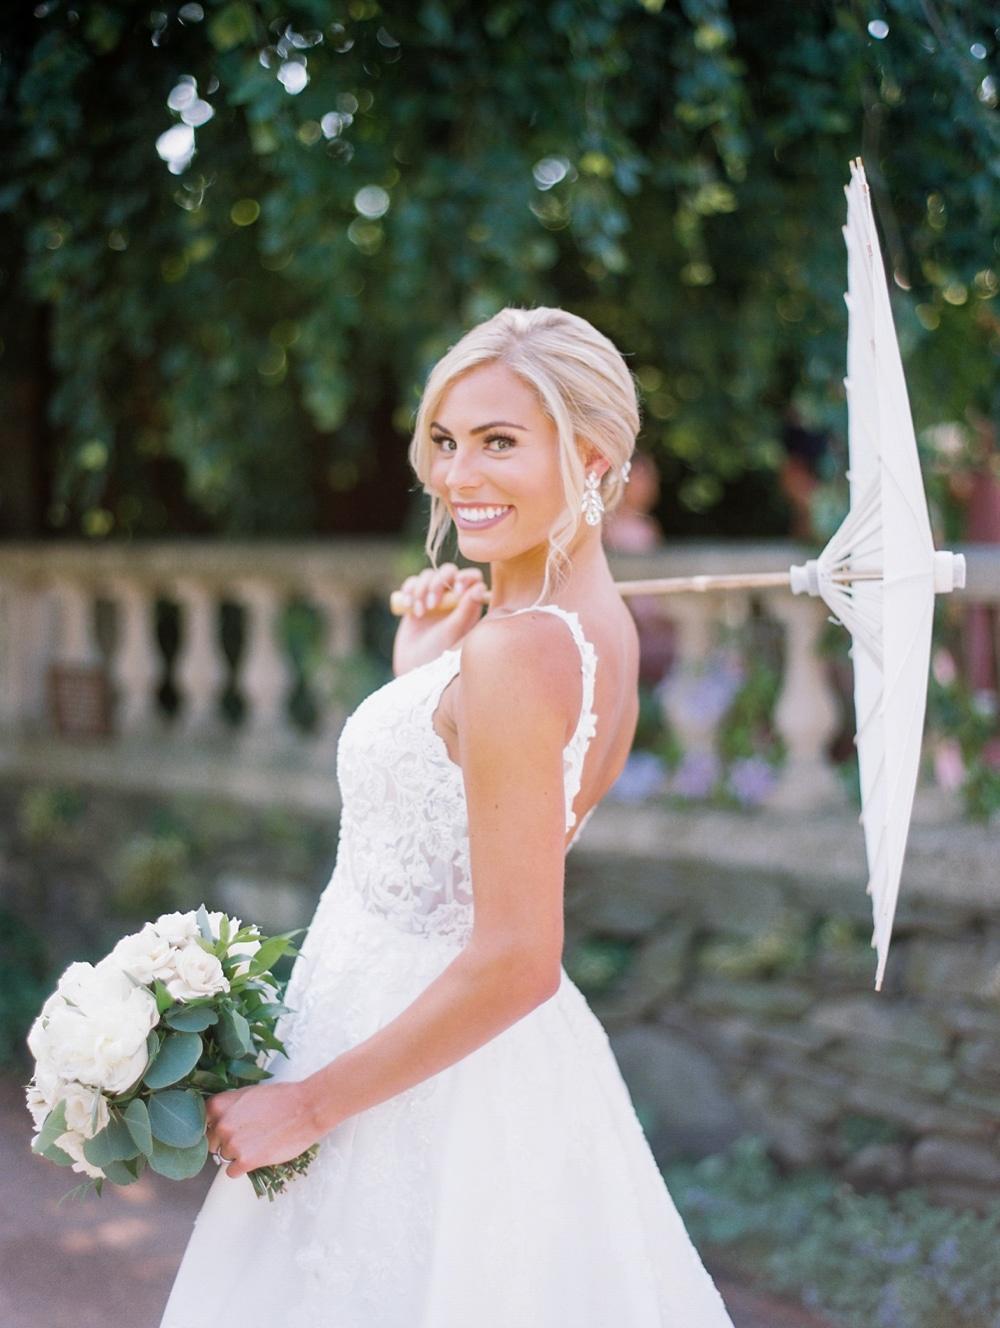 Kristin-La-Voie-Photography-chicago-botanic-garden-wedding-photos-128